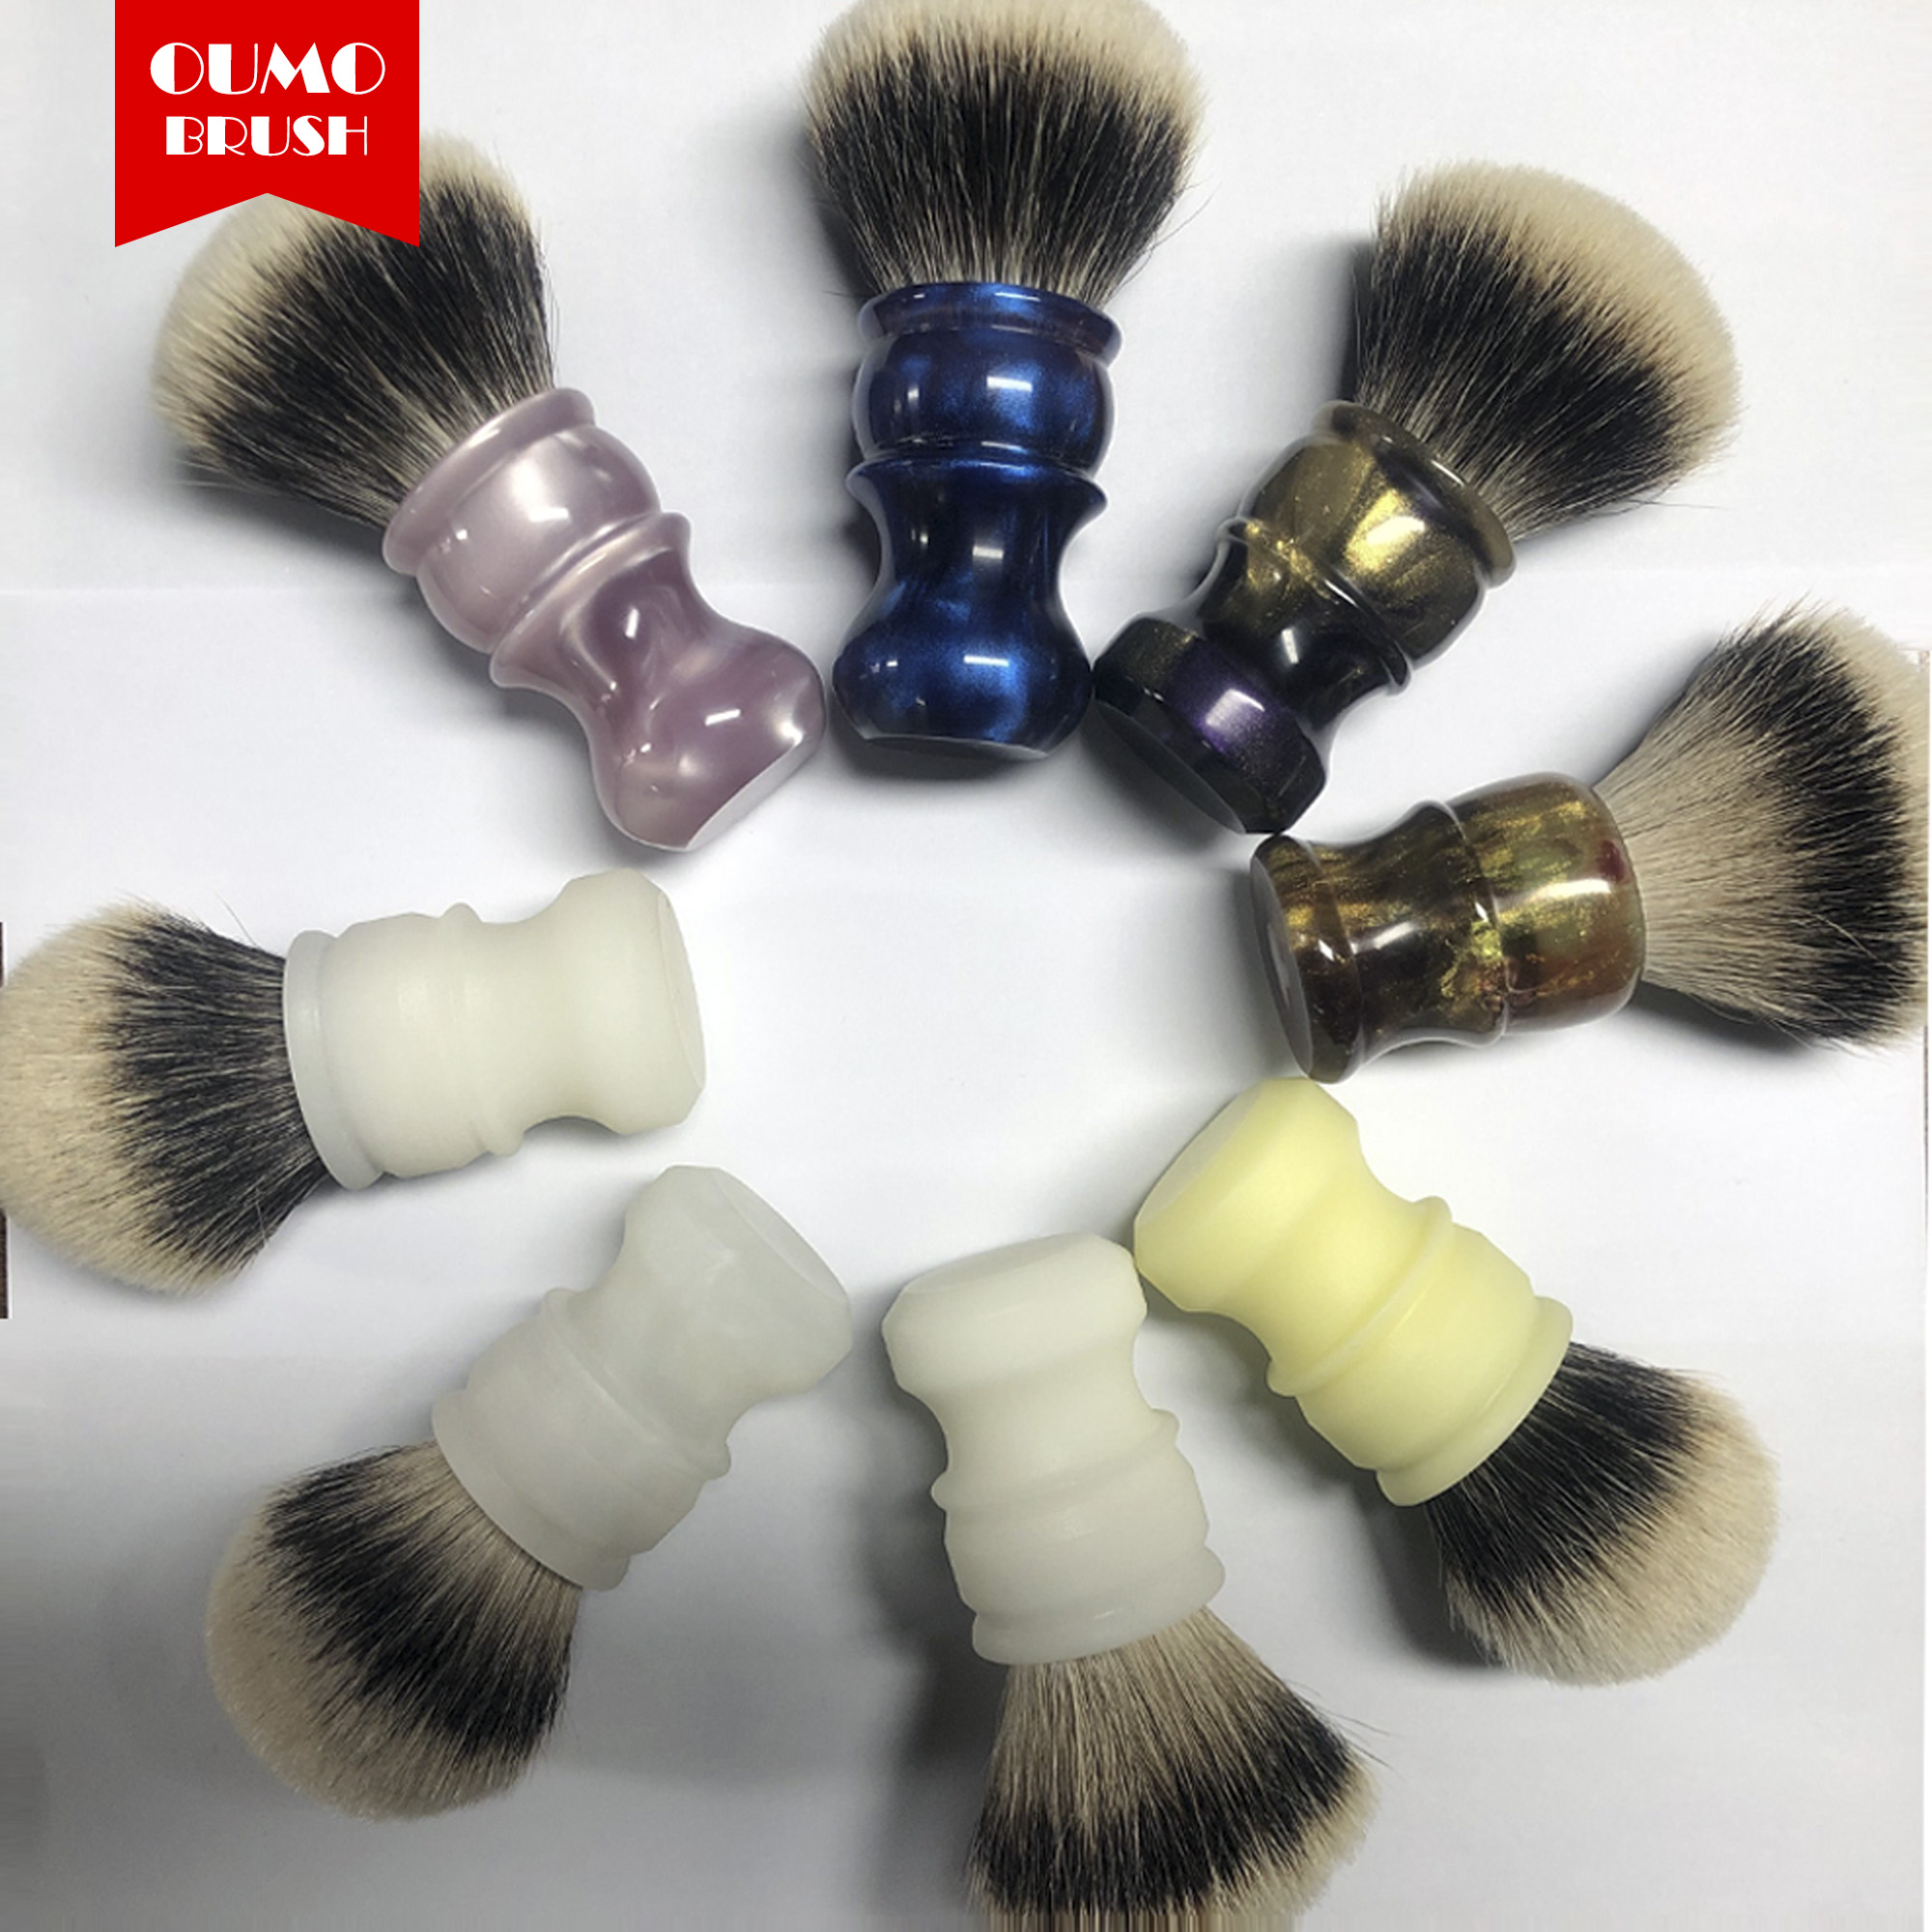 OUMO BRUSH-promotion Handmade Shaving Brush With Silk HMW And Manchuria Knot